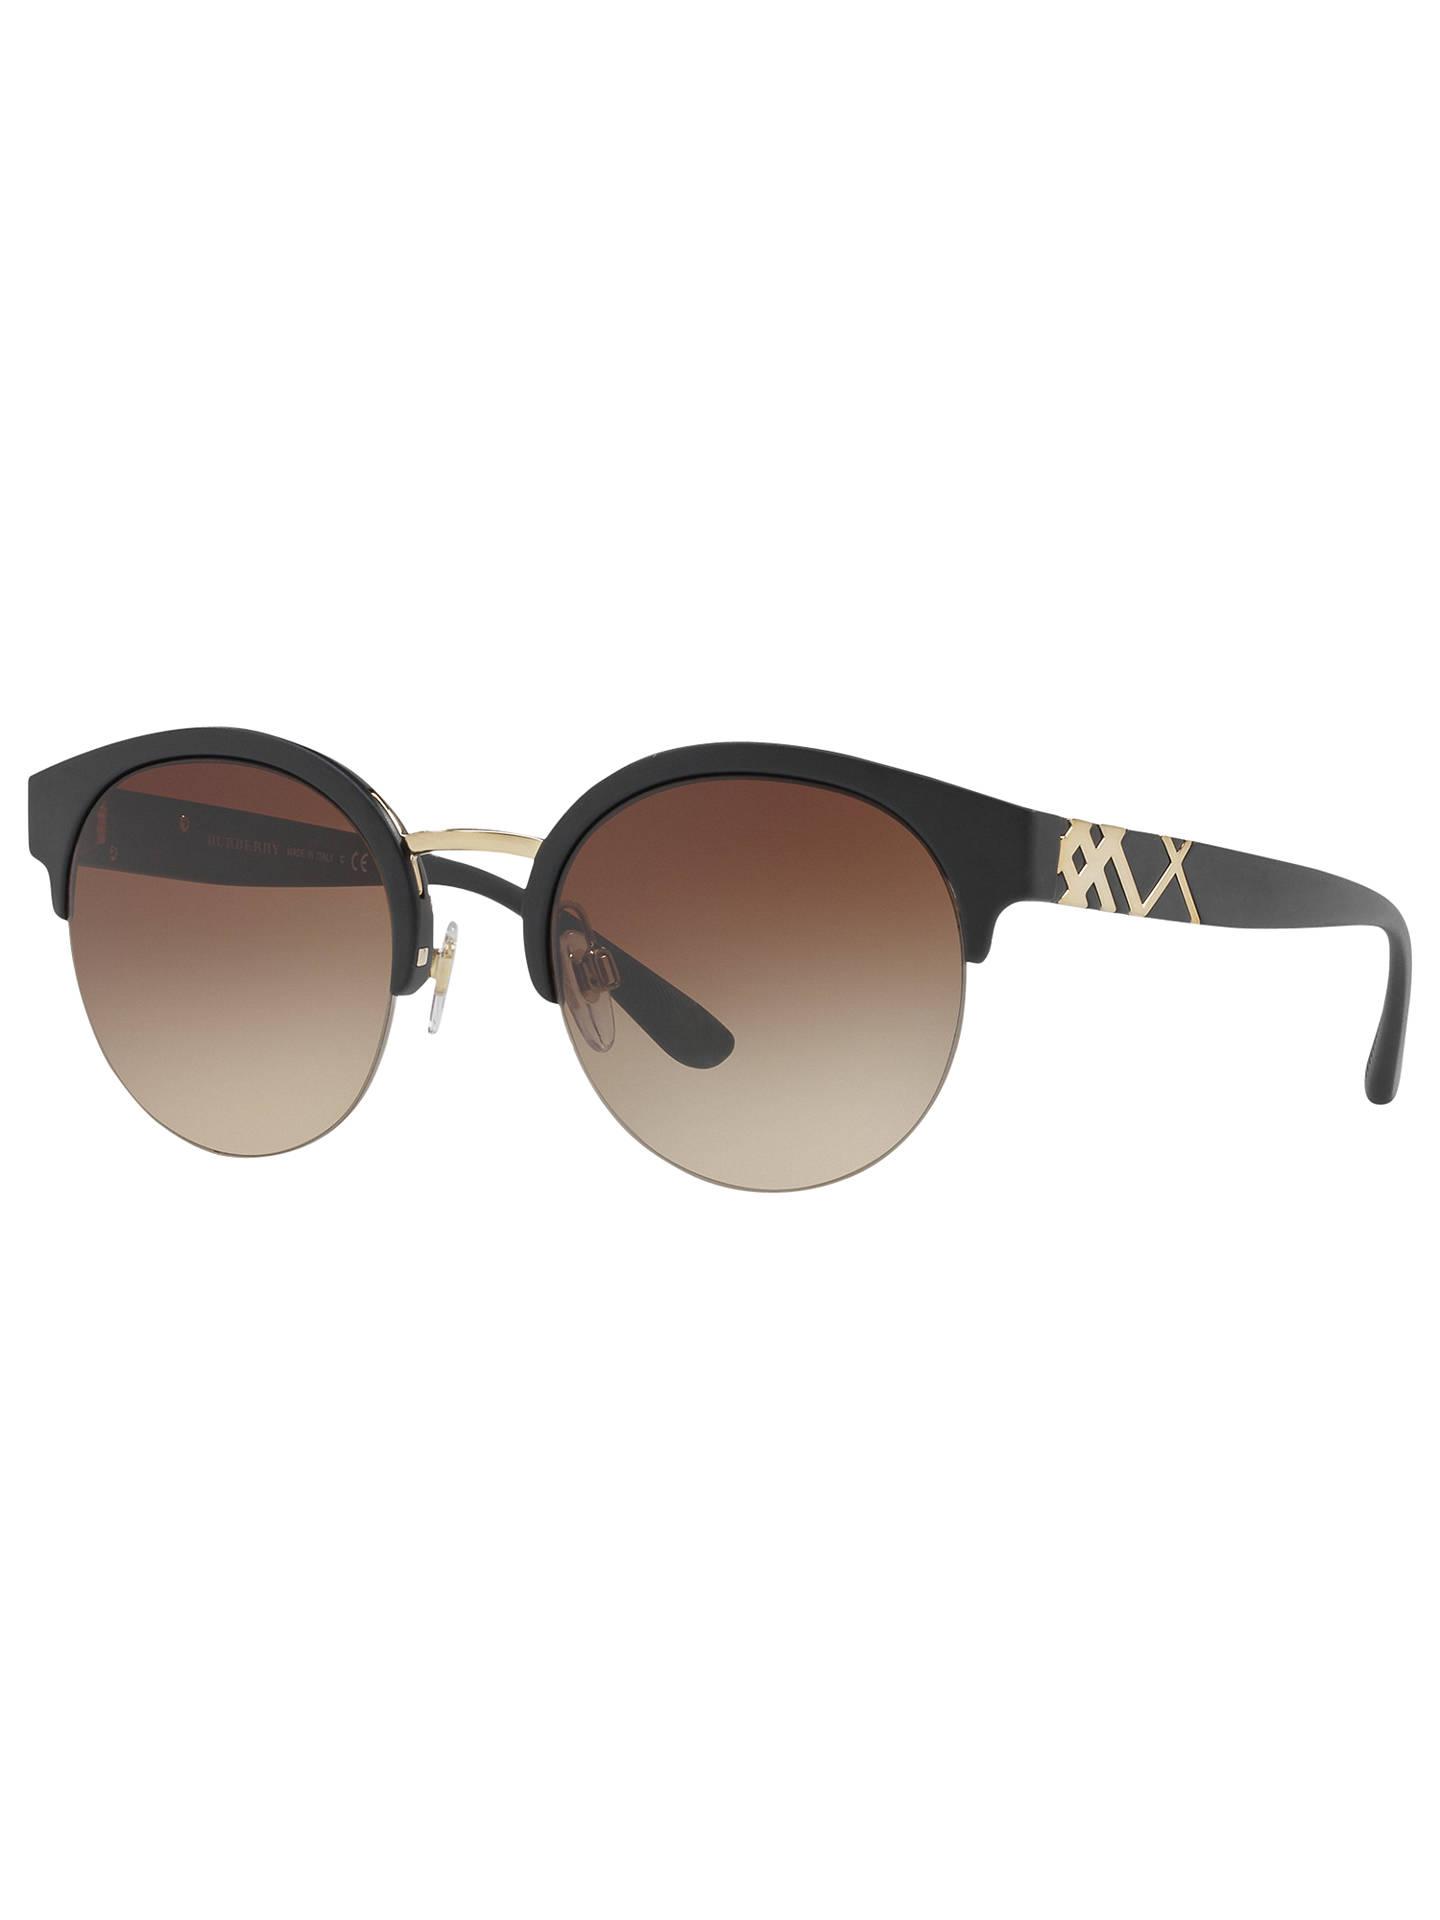 08cf6fd47b Burberry BE4241 Round Sunglasses at John Lewis   Partners